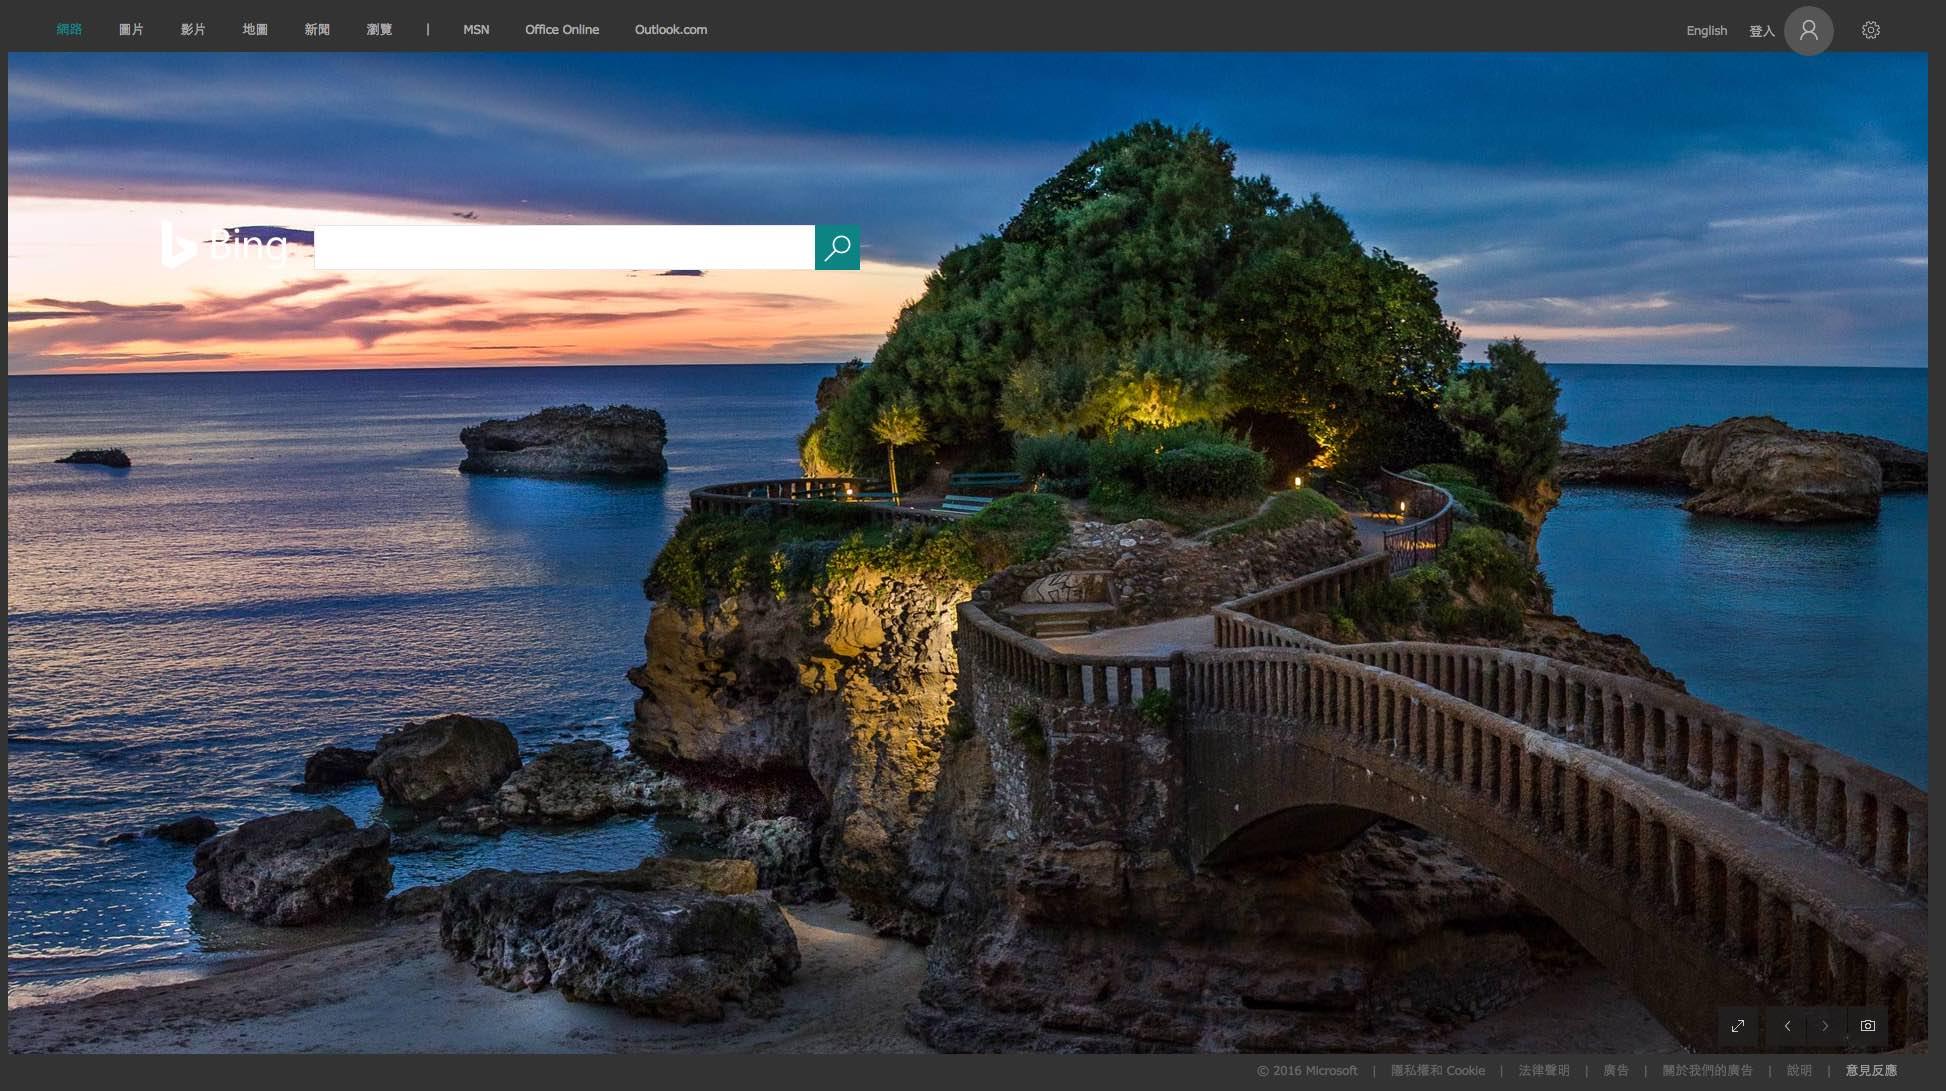 Biarritz en Bing Corea